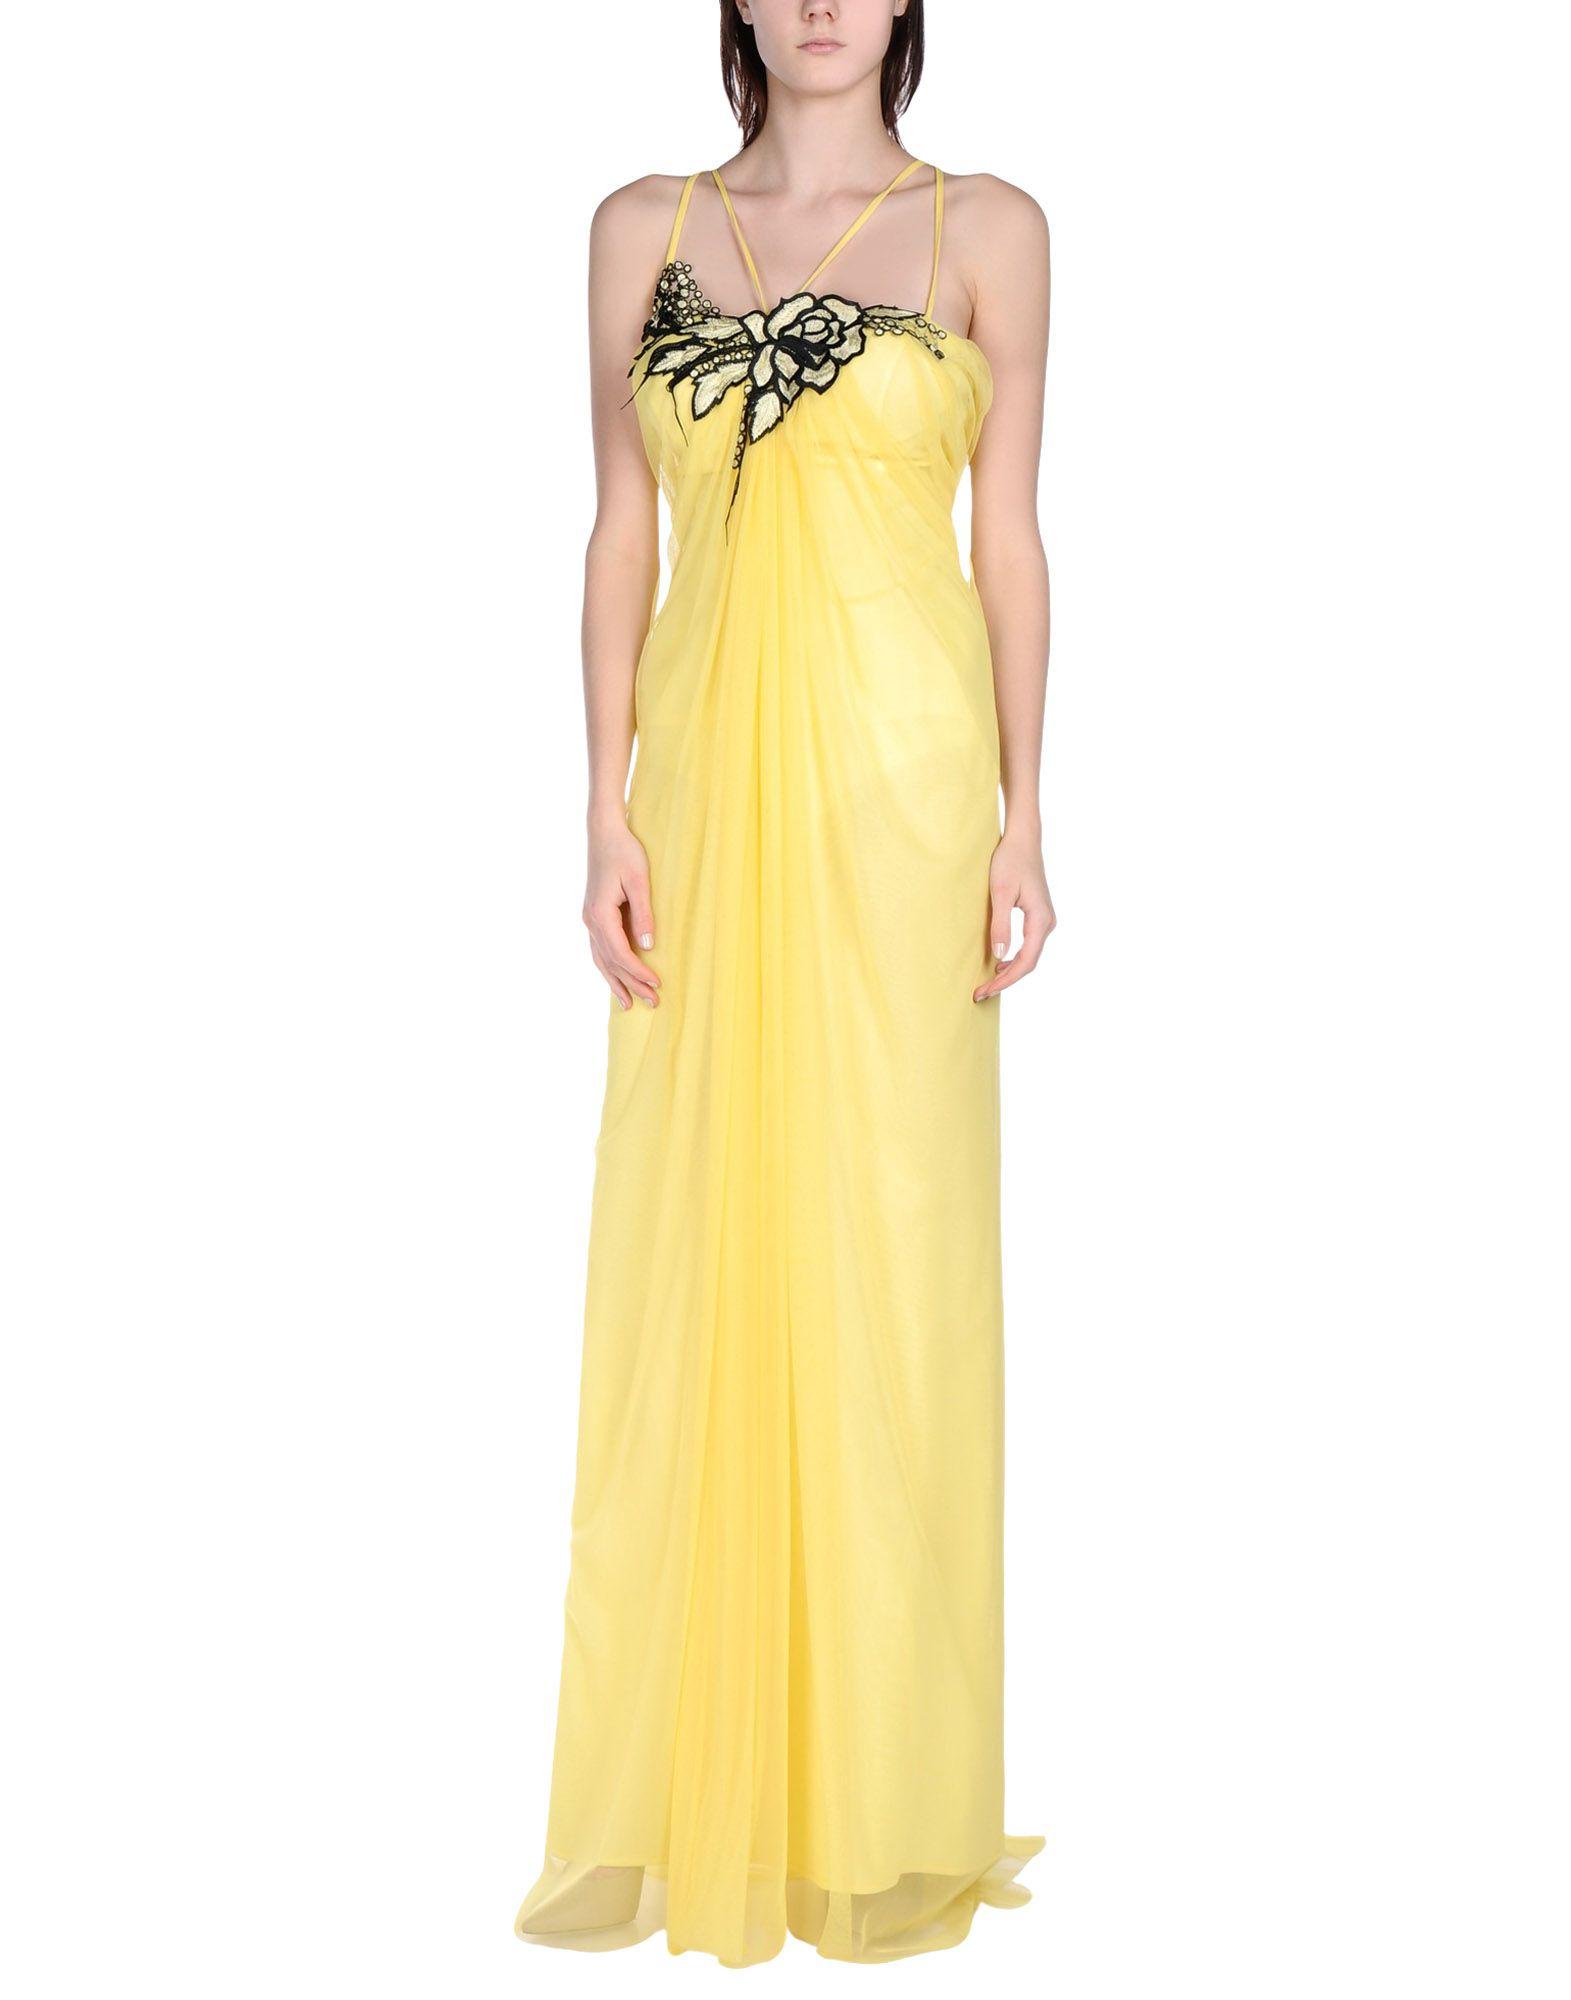 Vestito Lungo X s Milano Donna - Acquista online su YOOX - 34685698ND c169eaabd87